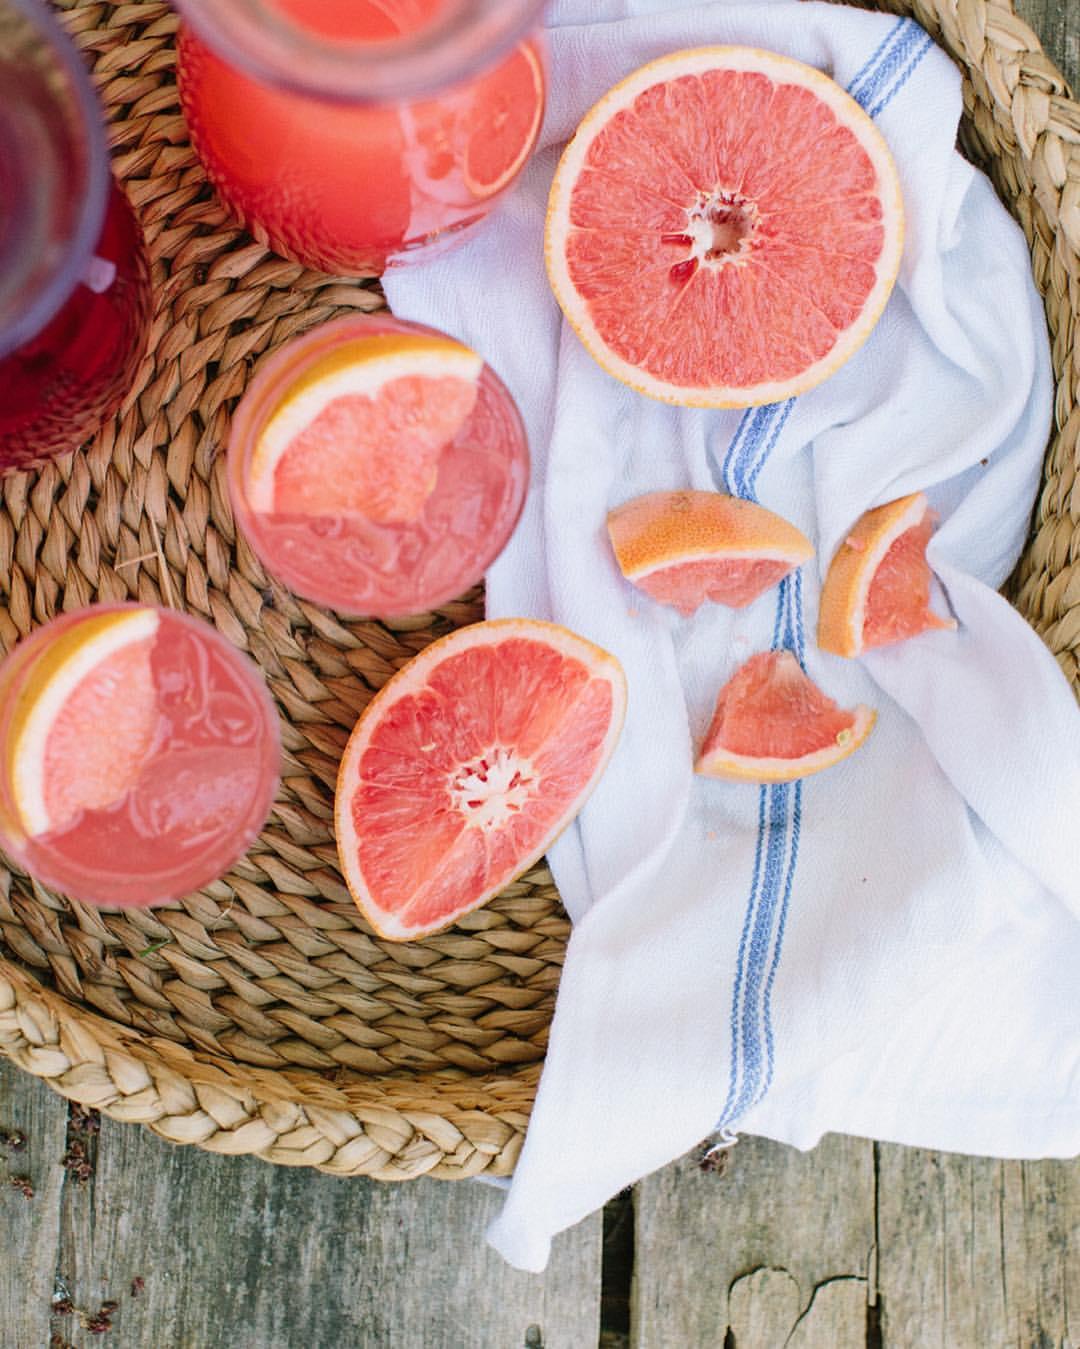 Early summer weekend cocktail hours justified by juice 🍹🍊🍍 📷:: Erin McGinn   Styling: 🙋🏼 (at Weekapaug Inn Beach)